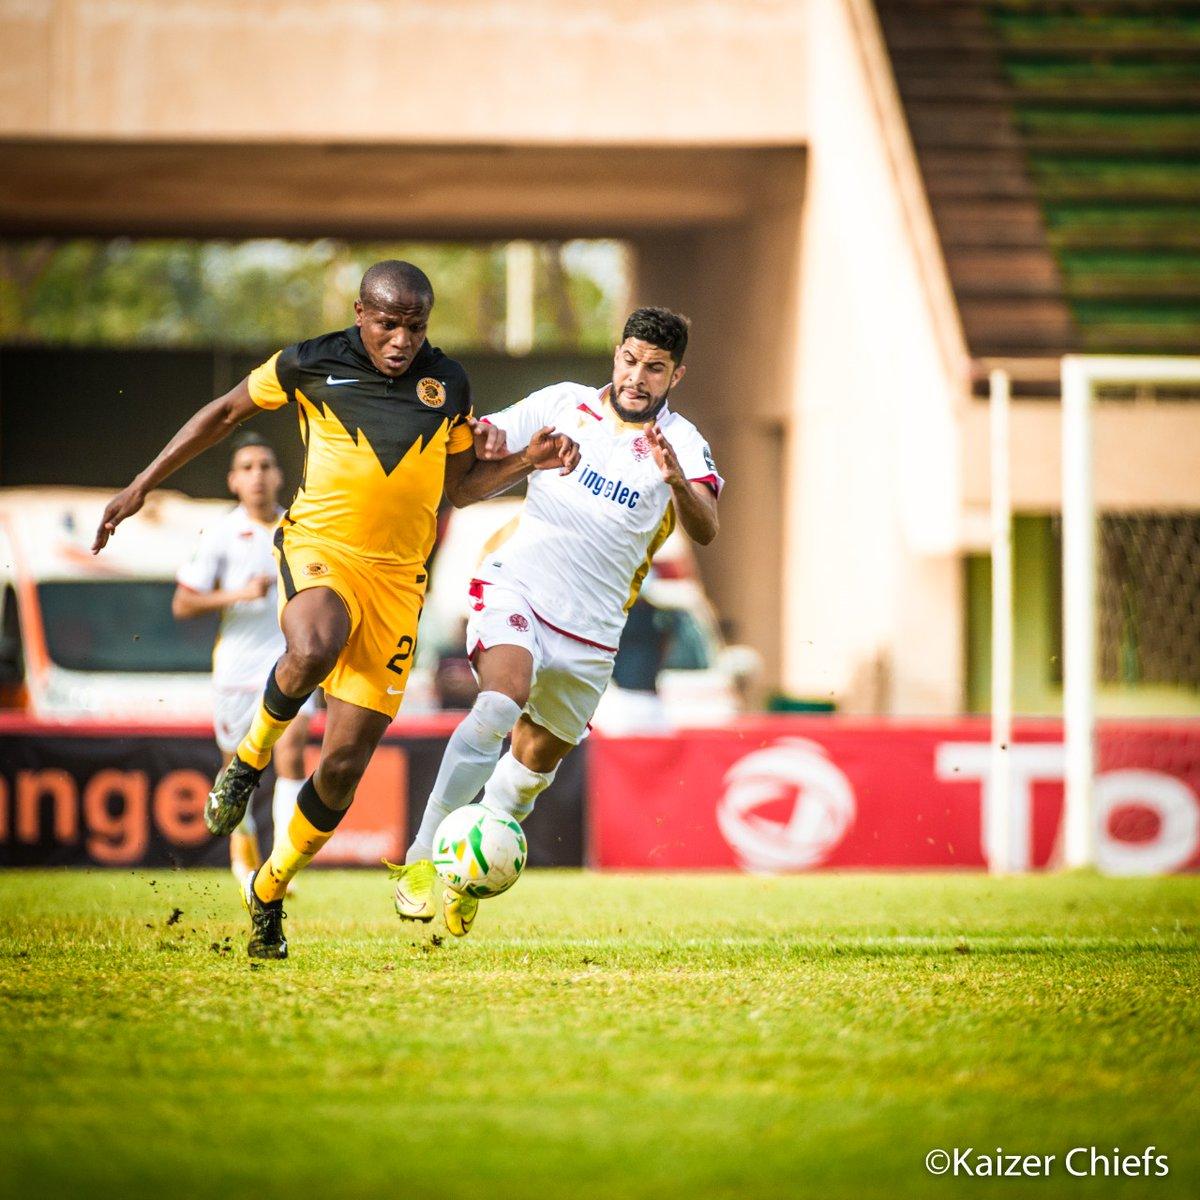 90 + 3'  #WAC 4 : 0 #CHI   Full time score: (Ounnajem  7', El Kaabi 44', Msuva 85', Jabrane. pen 90 + 4') Wydad Athletic Club 4 : 0  Kaizer Chiefs   #KCOneTeam #CAFCL #Amakhosi4Life